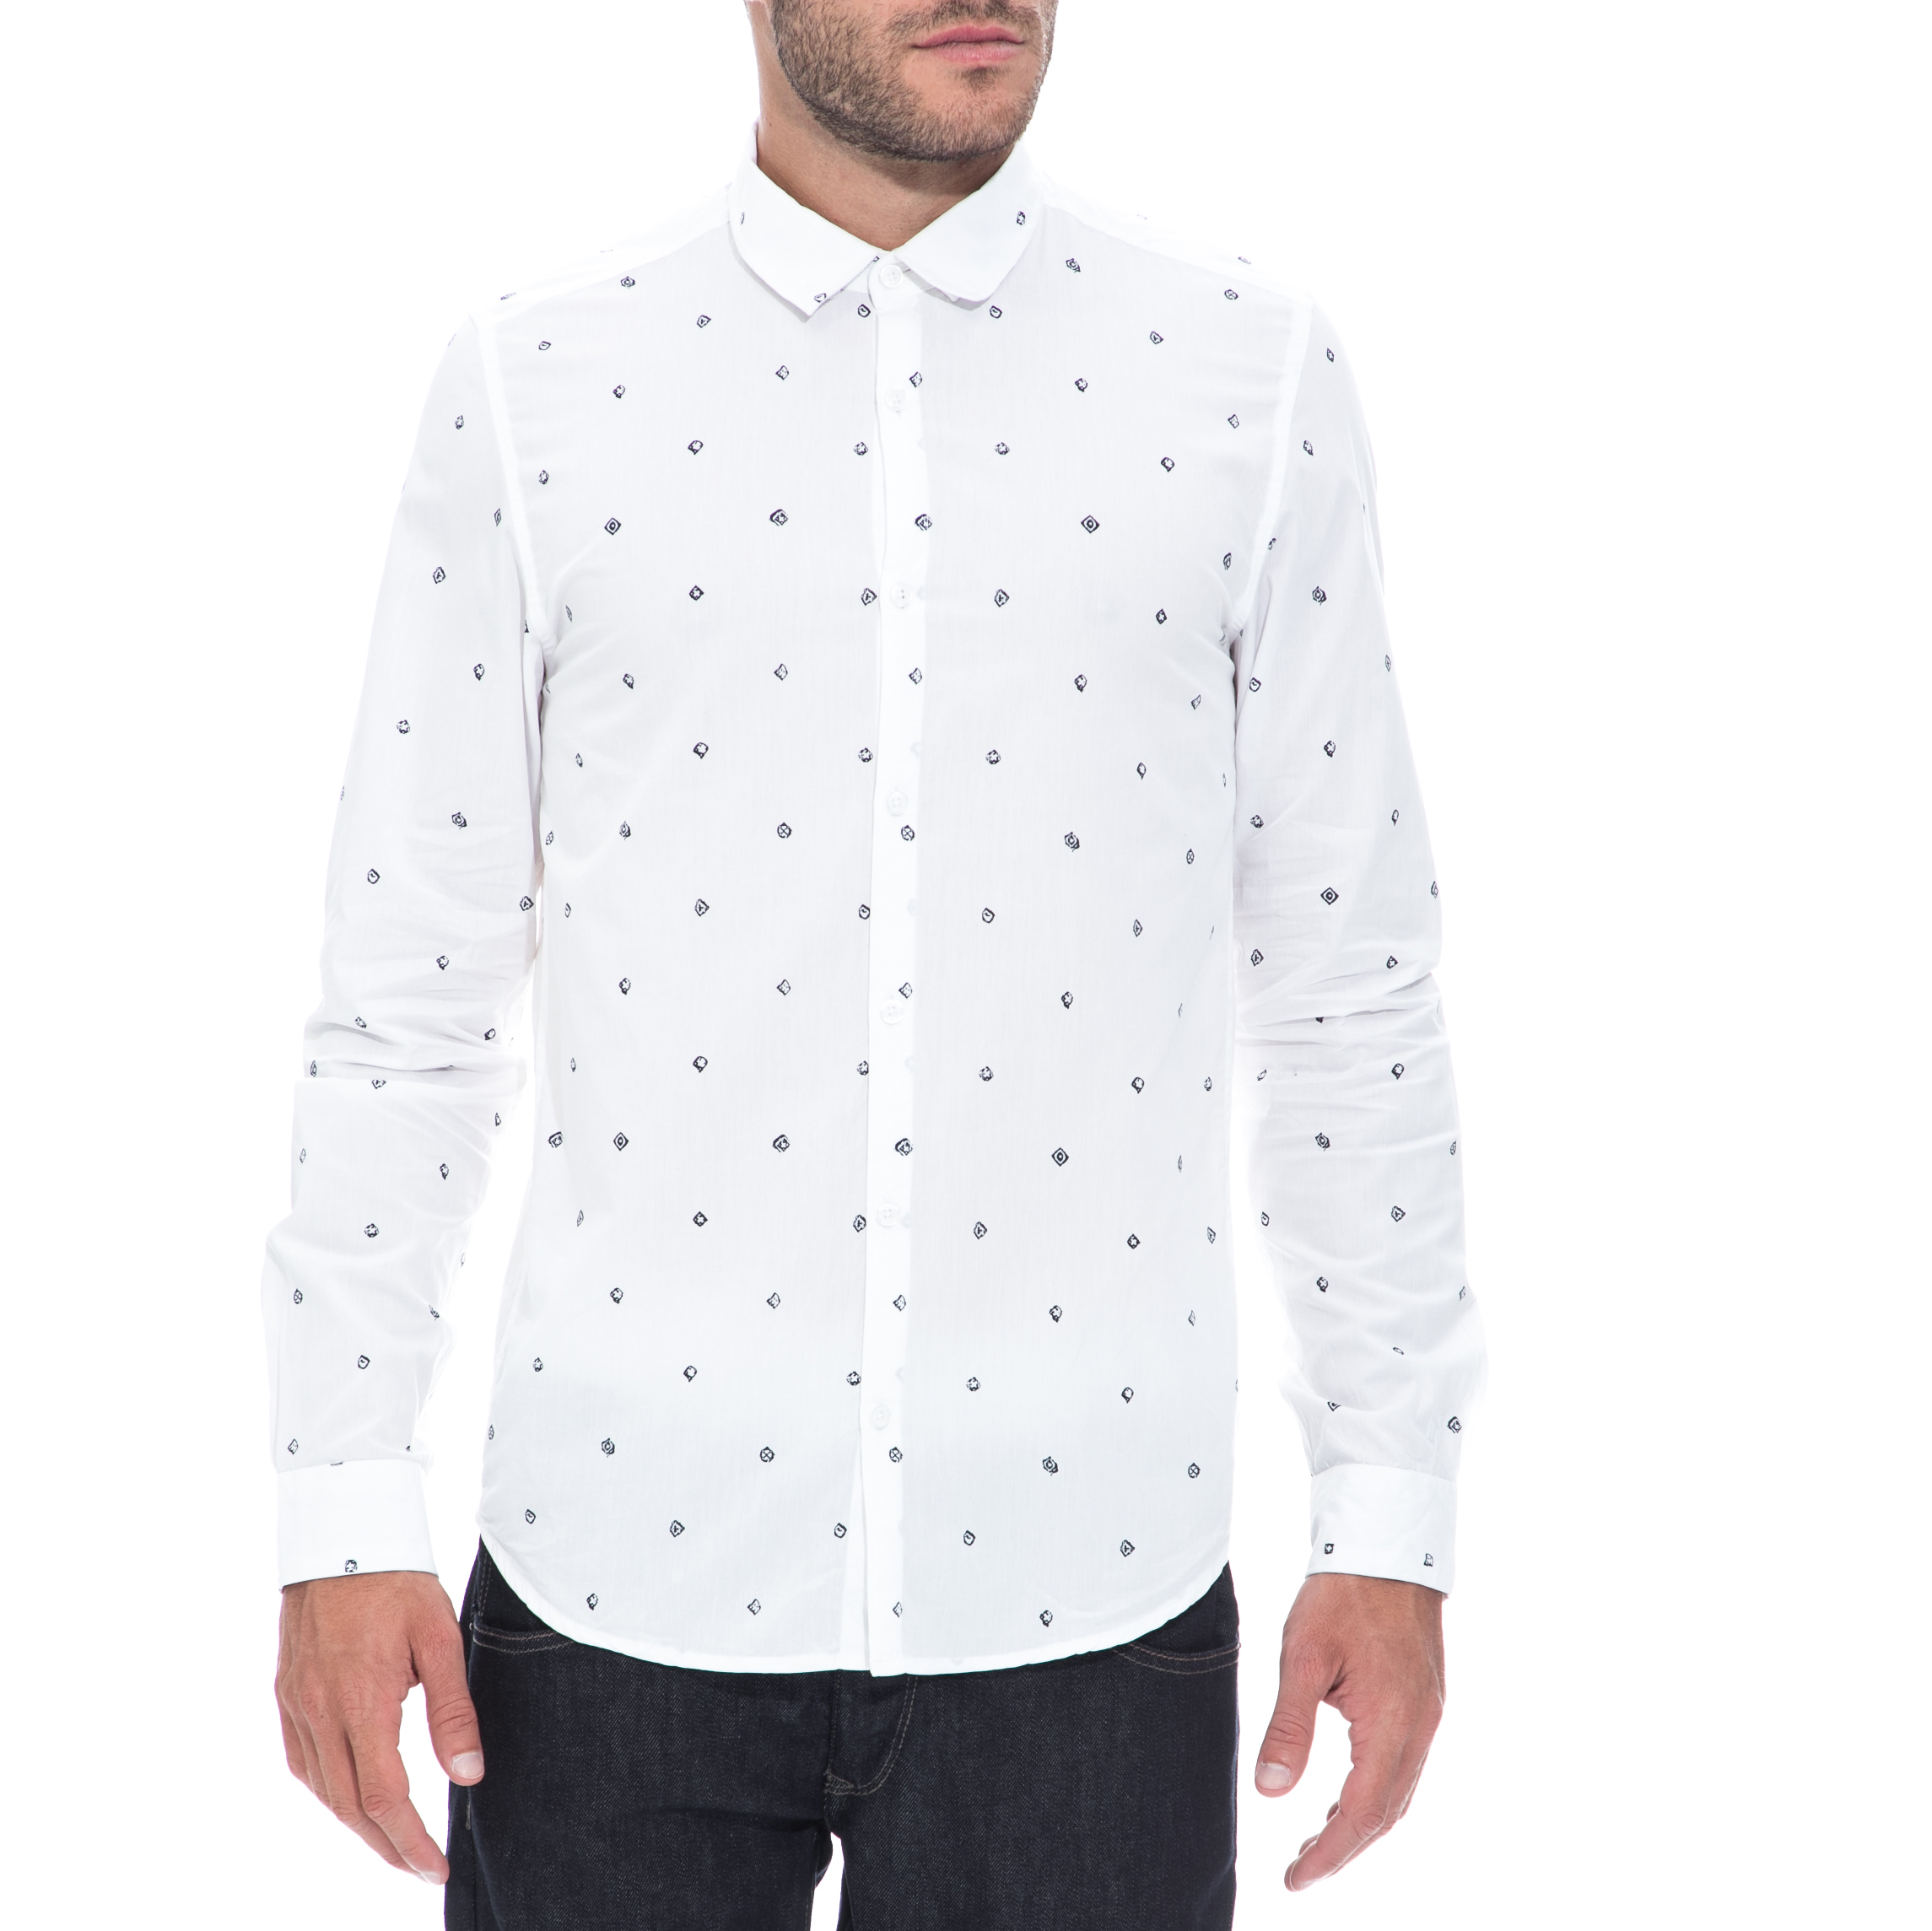 GARCIA JEANS - Αντρικό πουκάμισο GARCIA JEANS άσπρο ανδρικά ρούχα πουκάμισα μακρυμάνικα